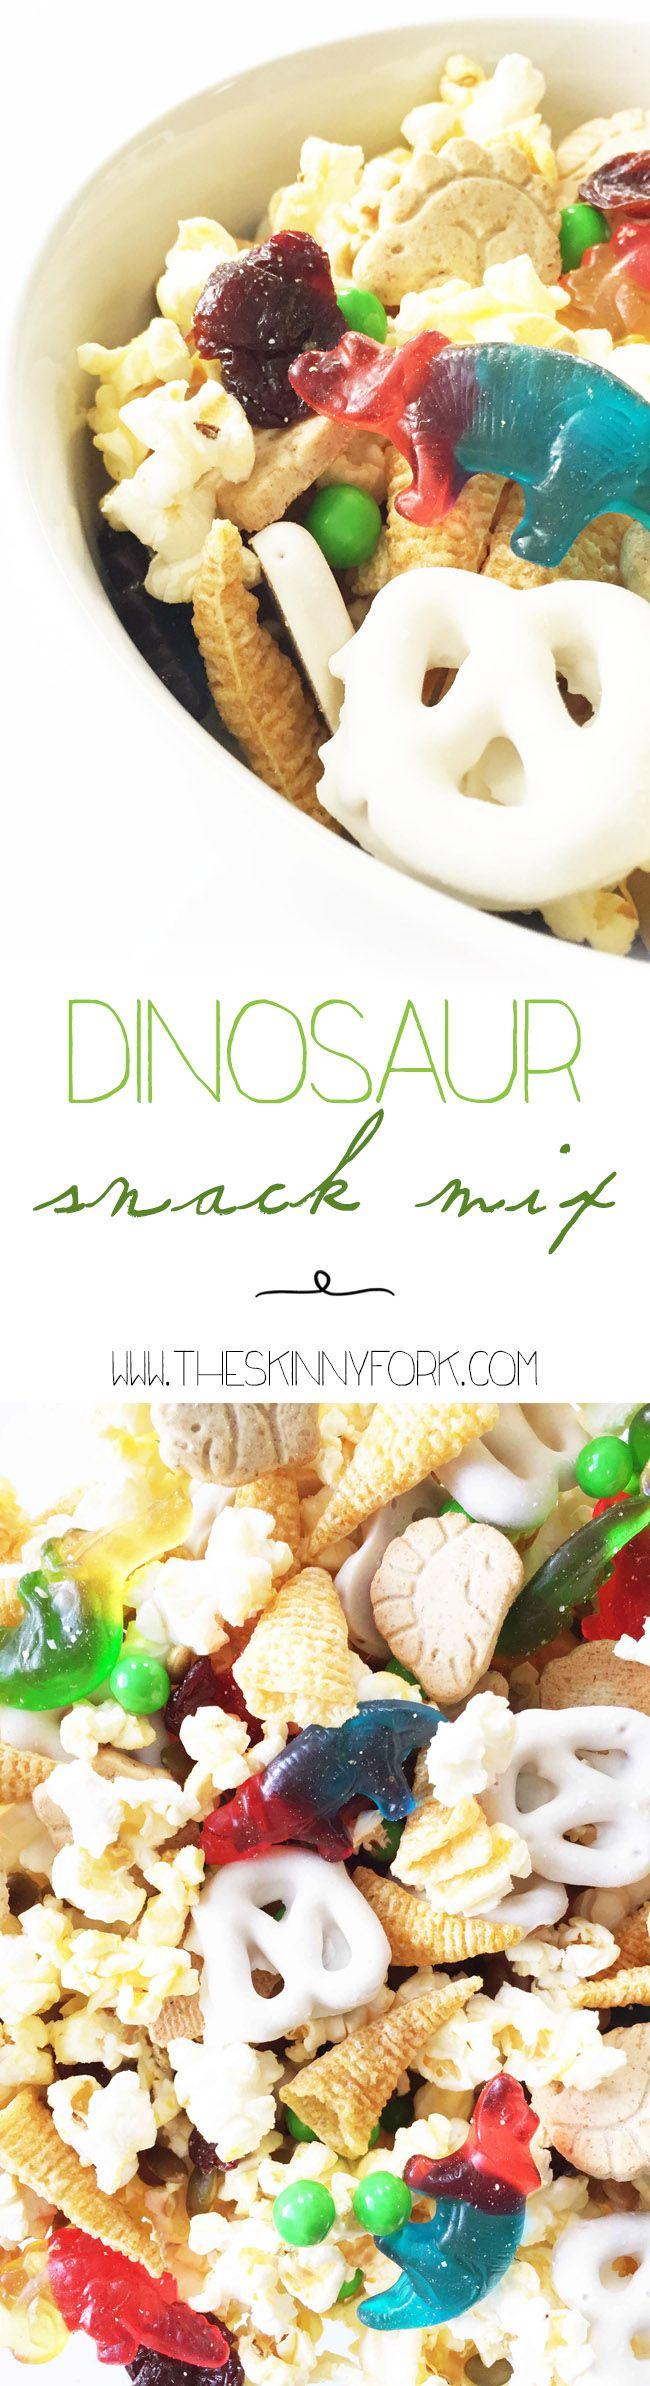 Best 25 Dinosaur Snacks Ideas On Pinterest Dinosaur